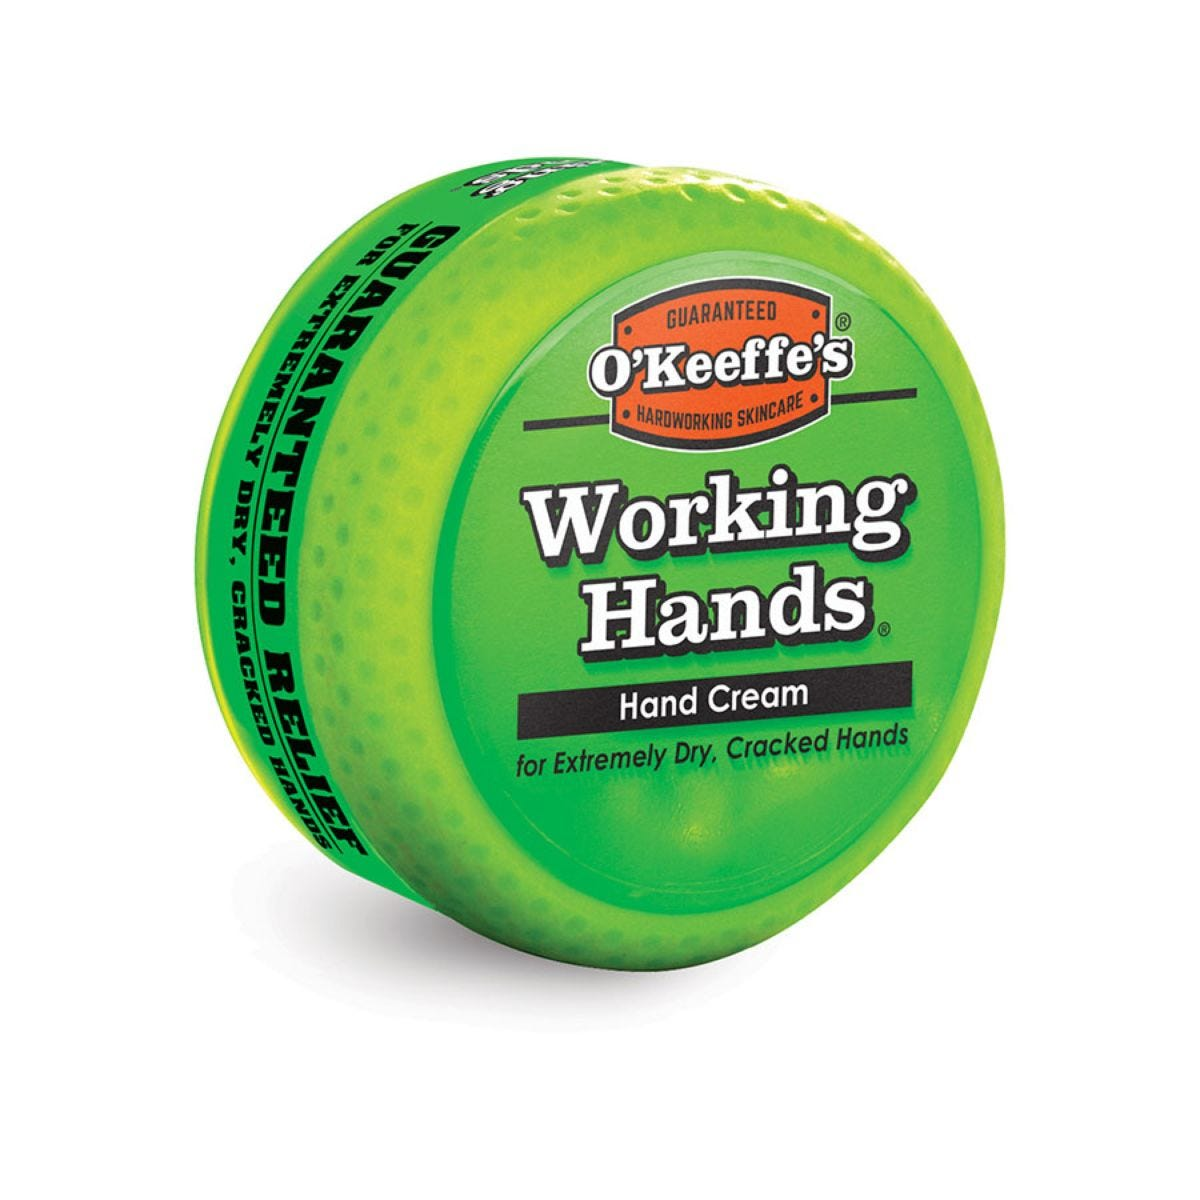 O'Keeffe's Working Hands Hand Cream Review | POPSUGAR Beauty